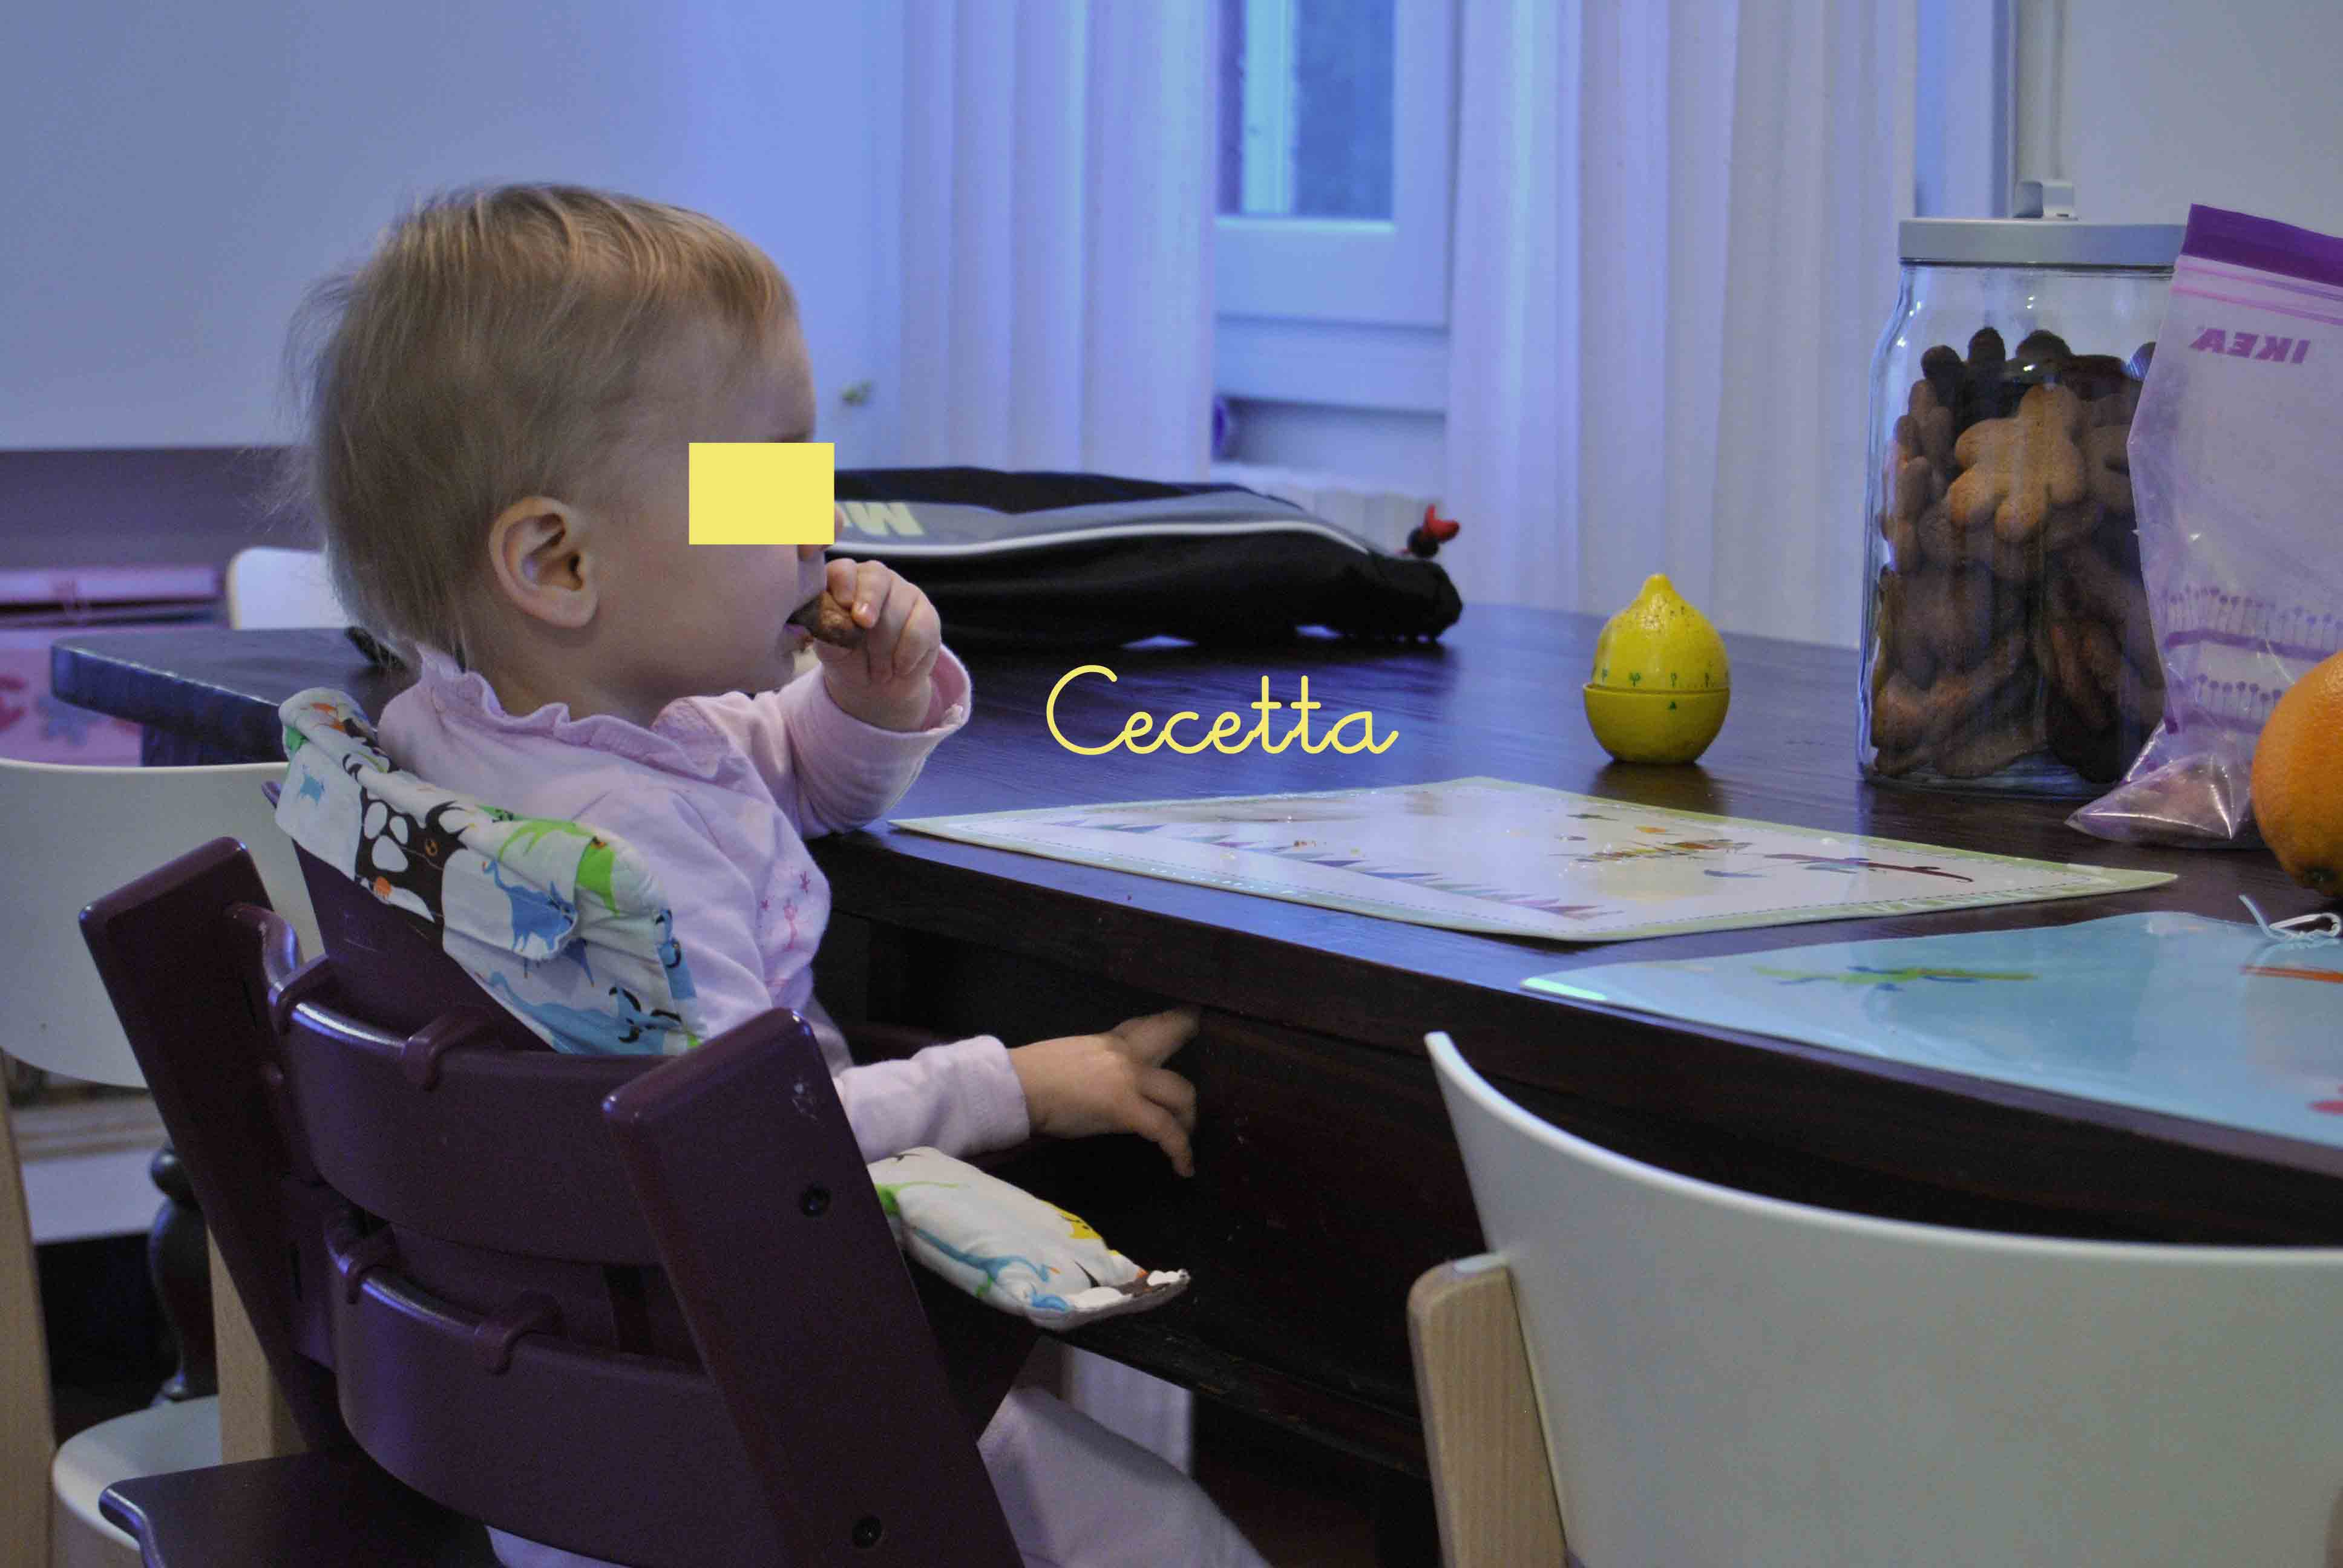 cecetta